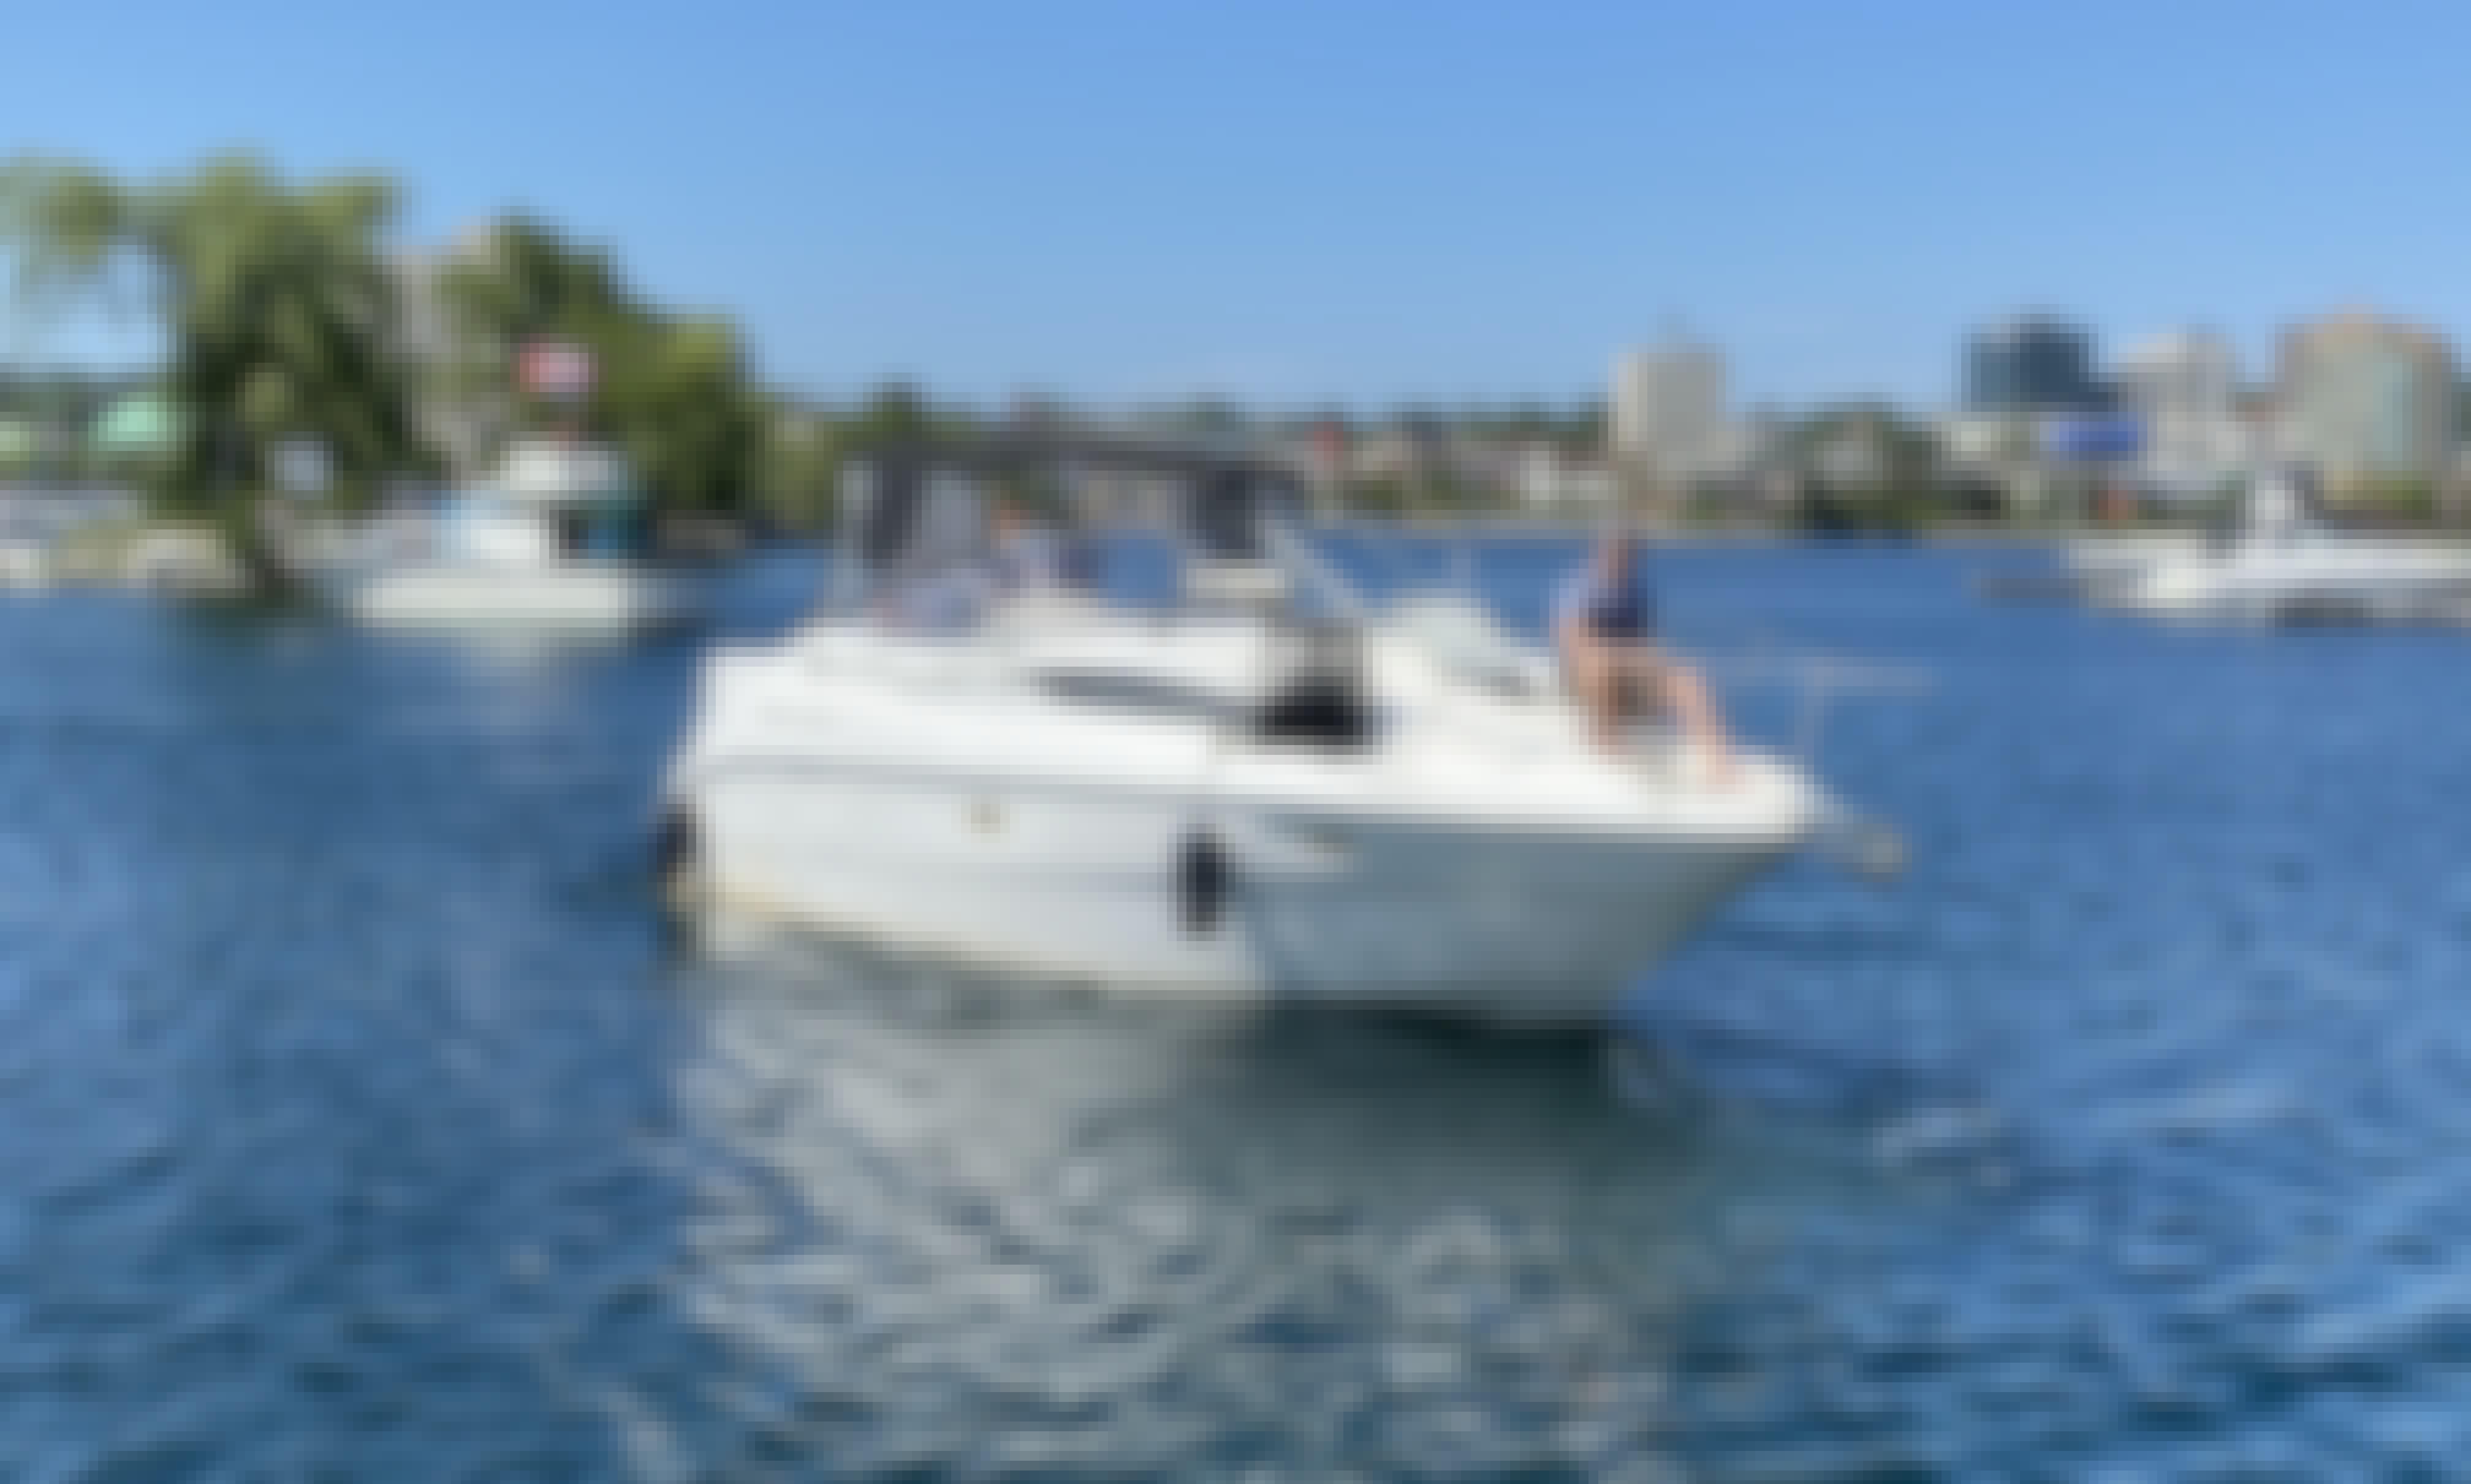 27' Bayliner 2655 Cierr Cuddy Cabin Rental in Keswick, CA Up to 6 Guests